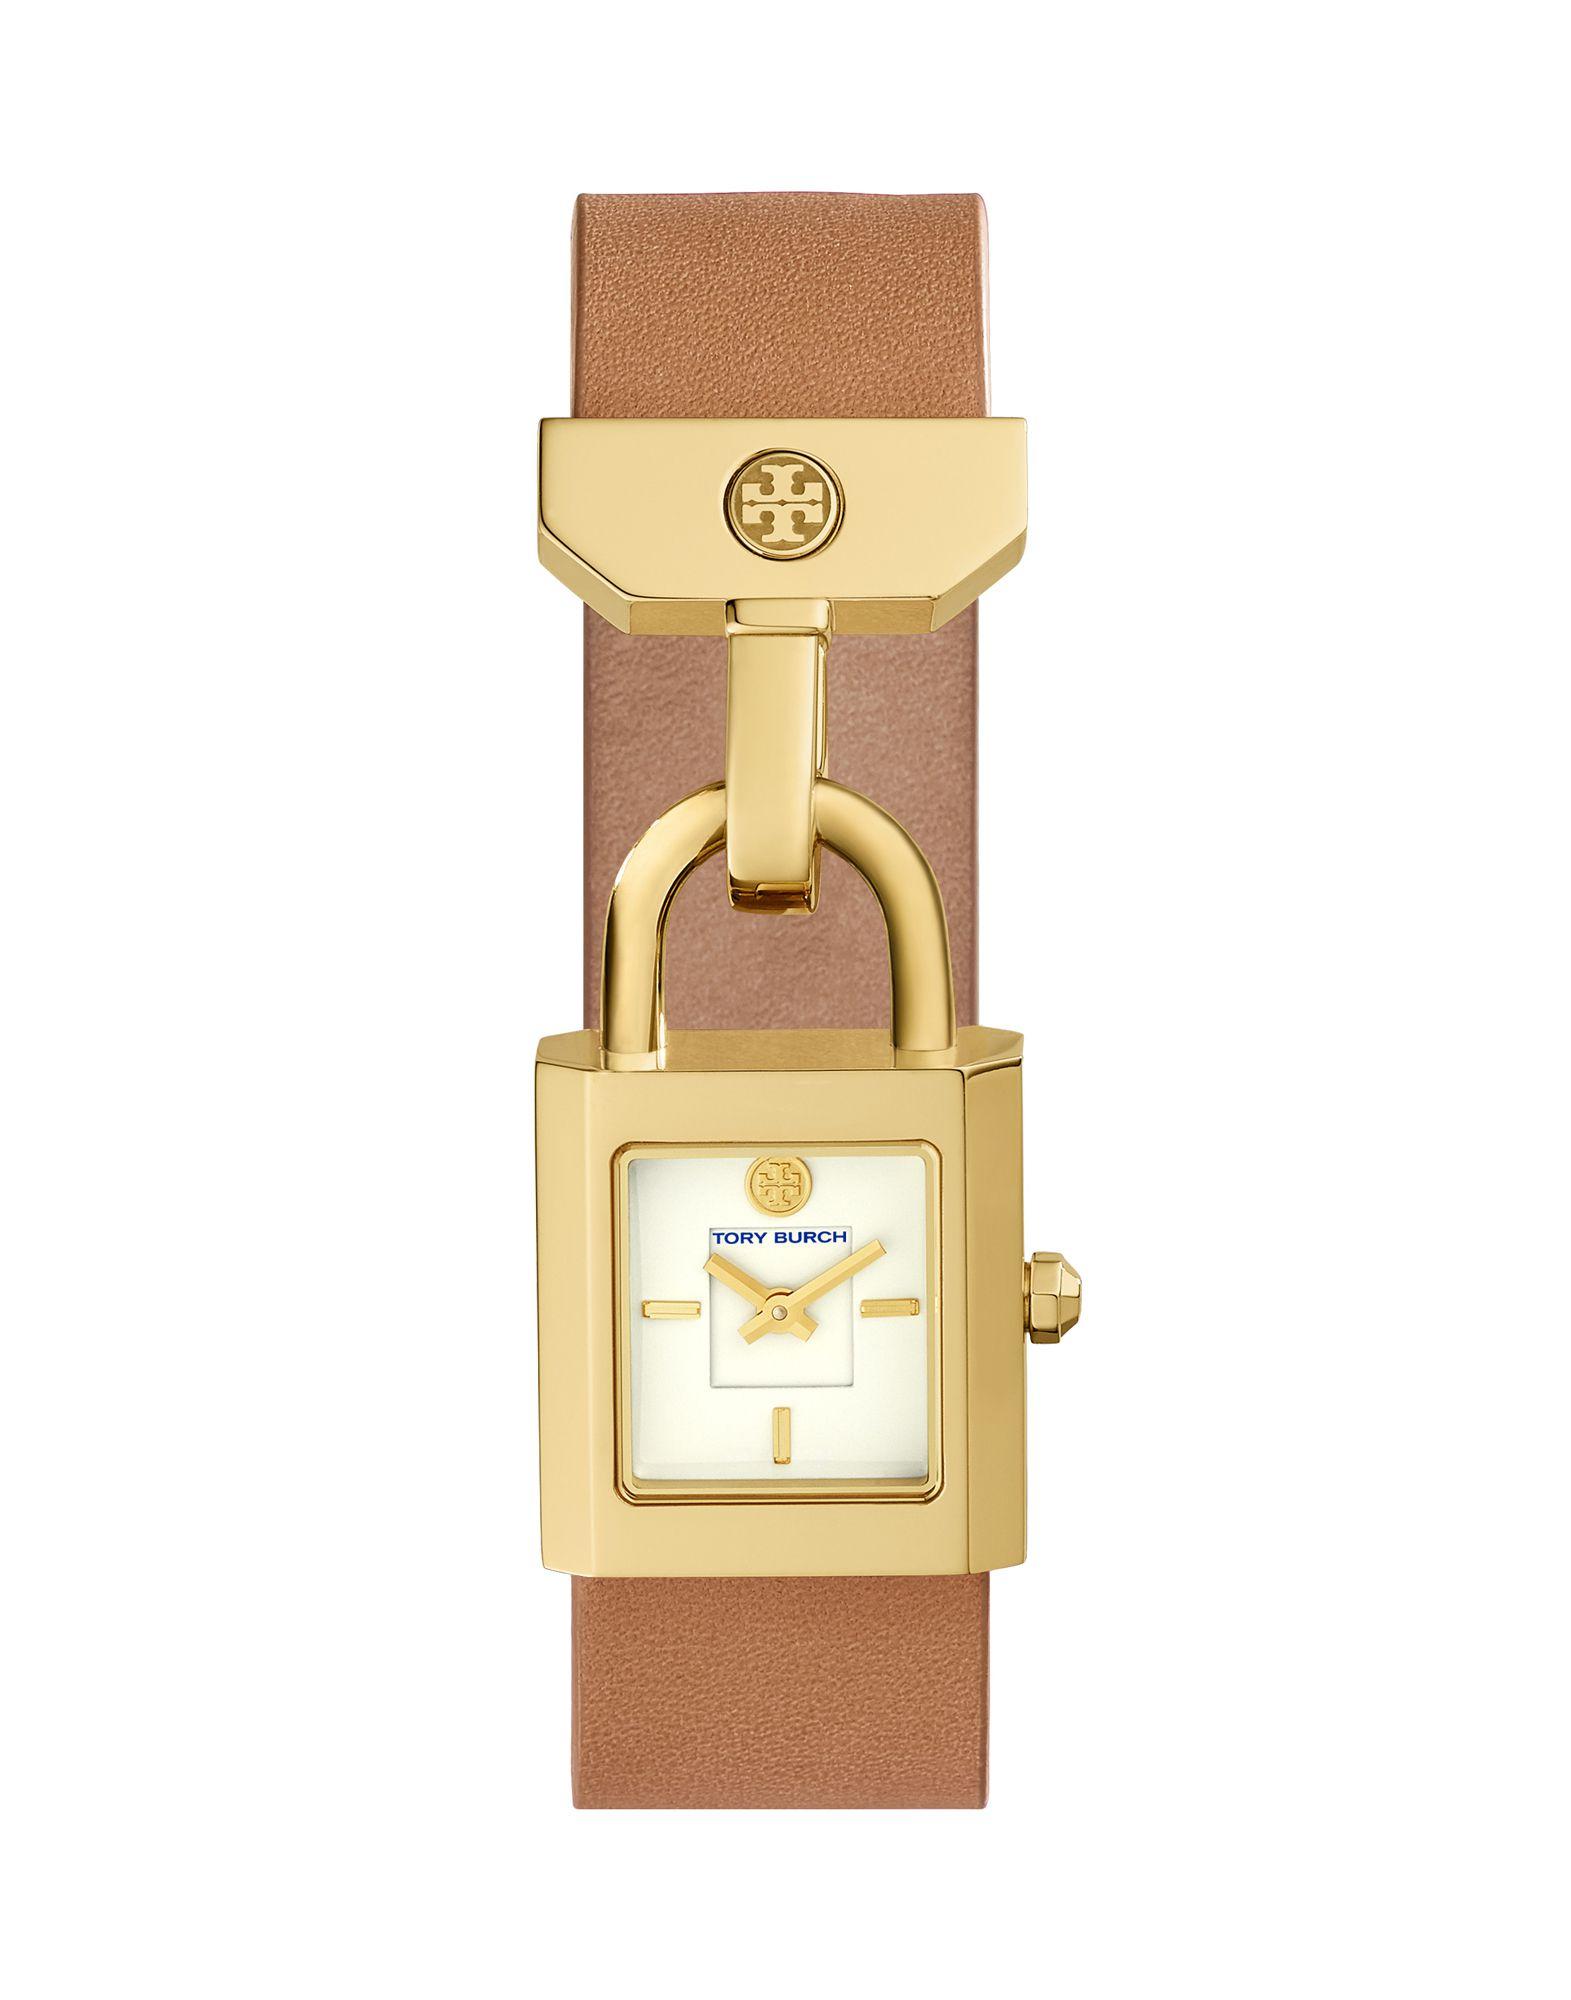 TORY BURCH Наручные часы часы relogio feminino мужчины ложная крокодил кожа blu ray часынаручные часы